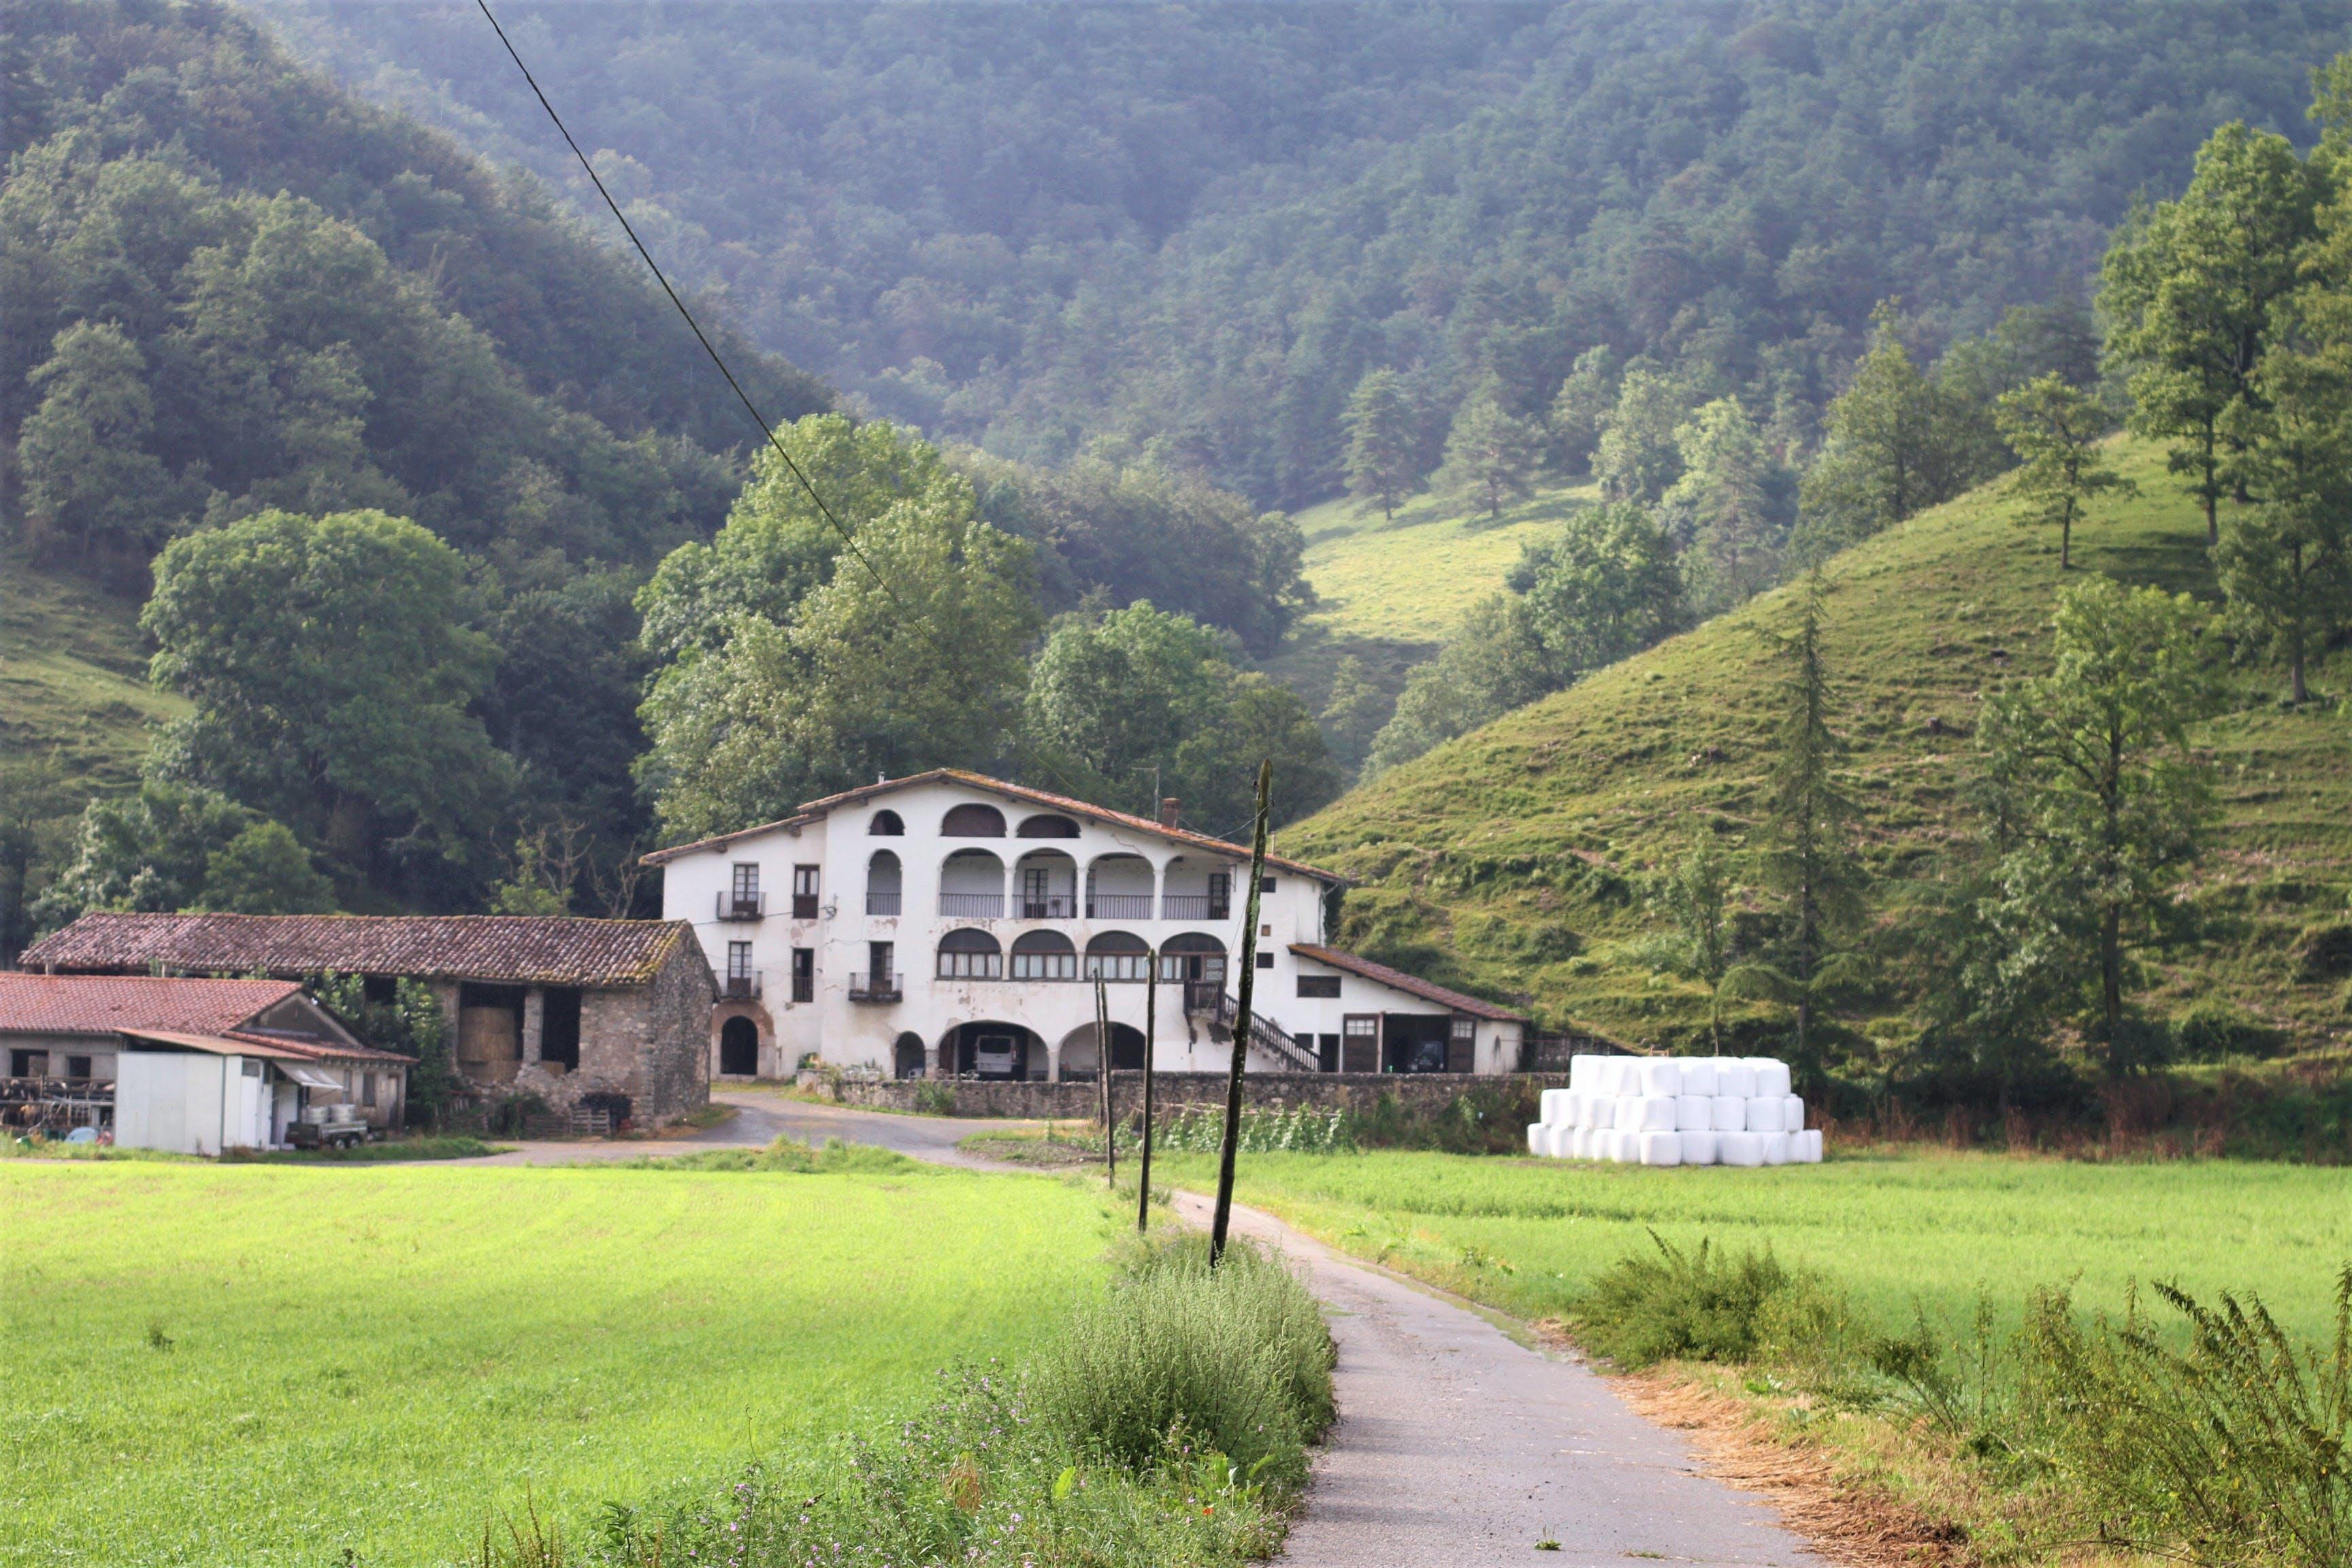 6 Residents   Vall de Camprodon   Stunning Rural House w/ Farm + Terrace